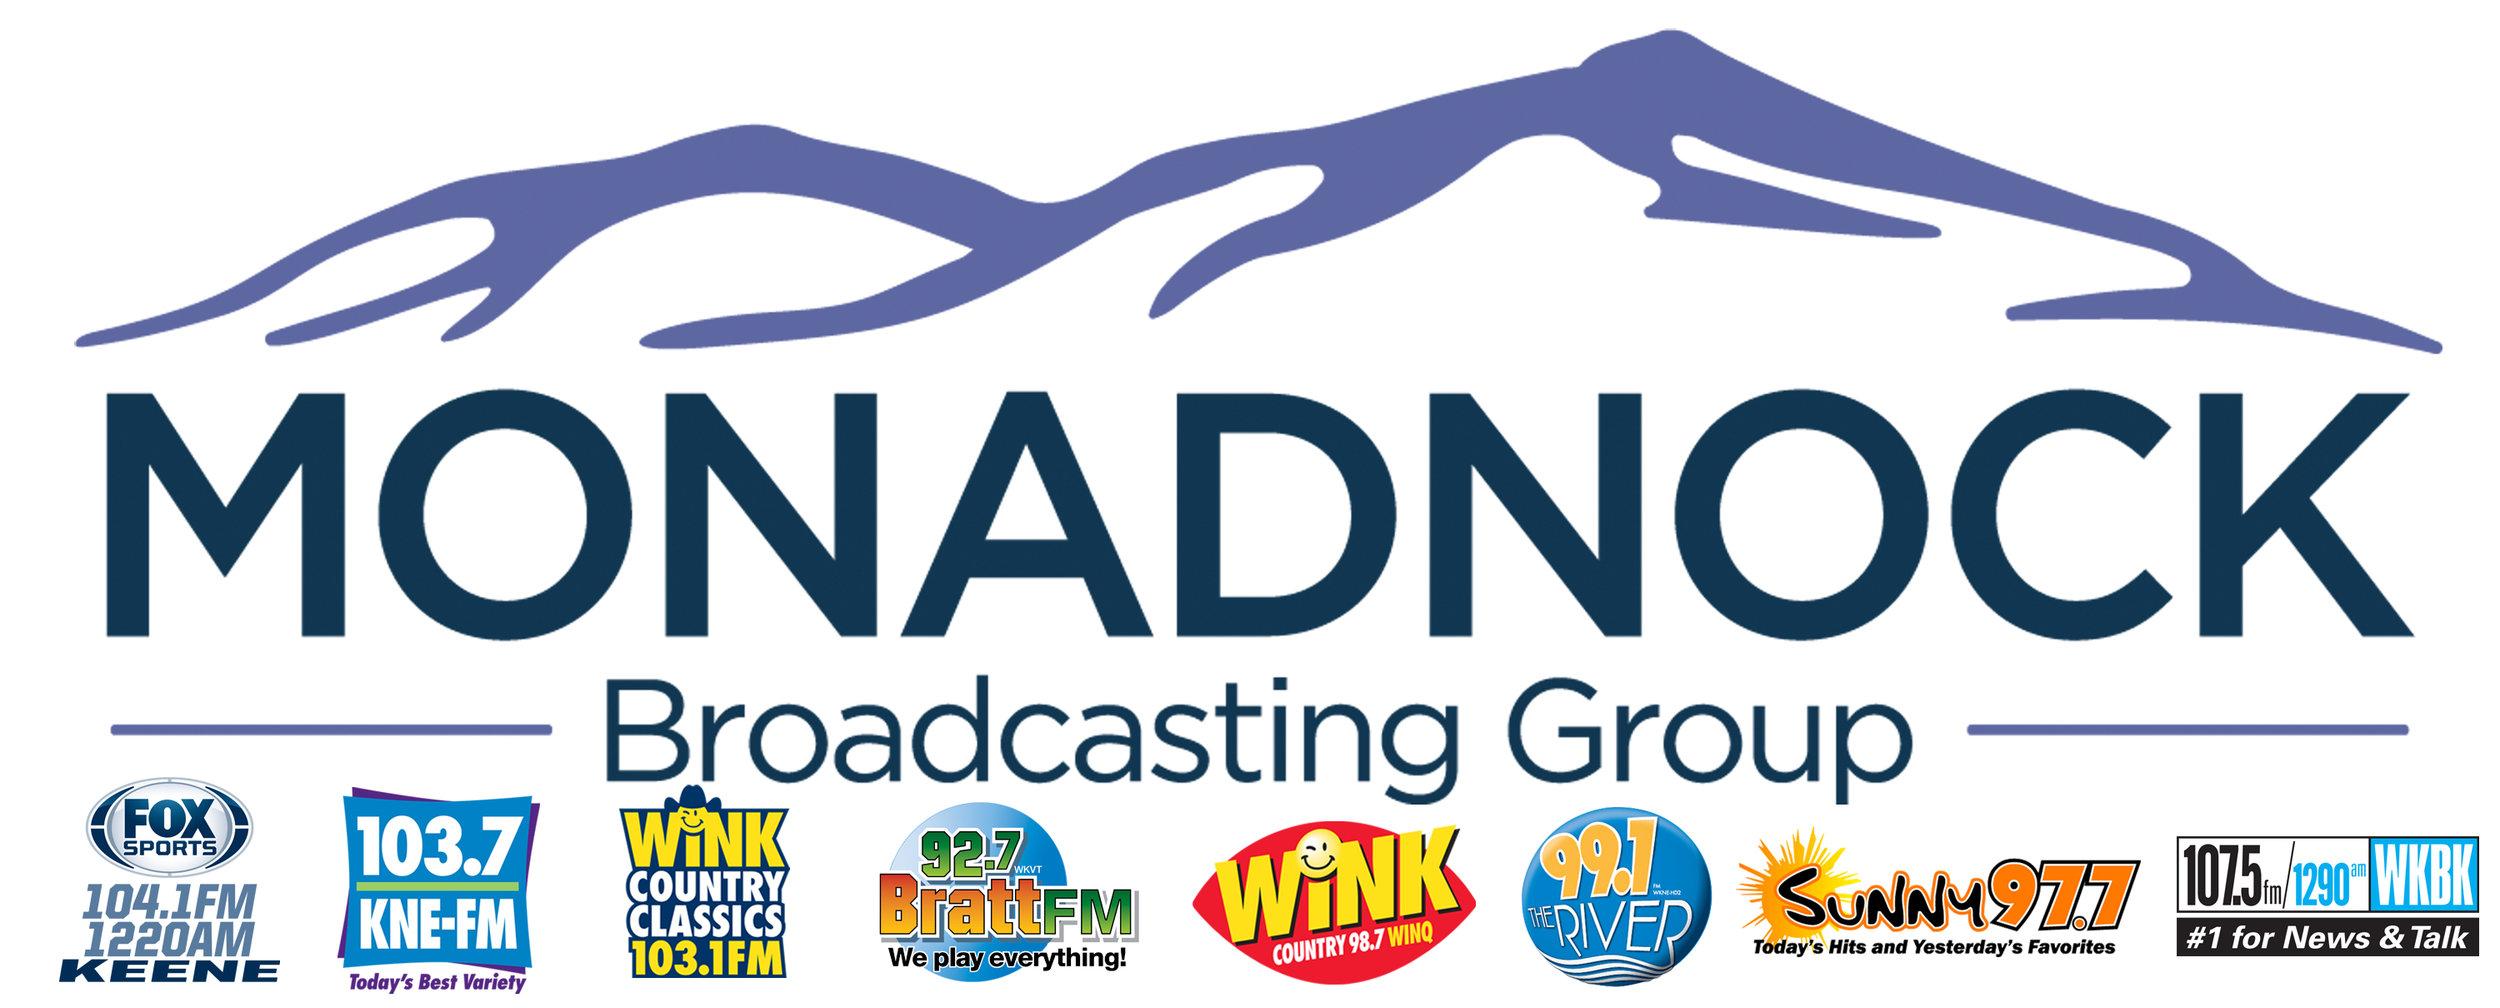 Monadnock Broadcasting Group.jpg